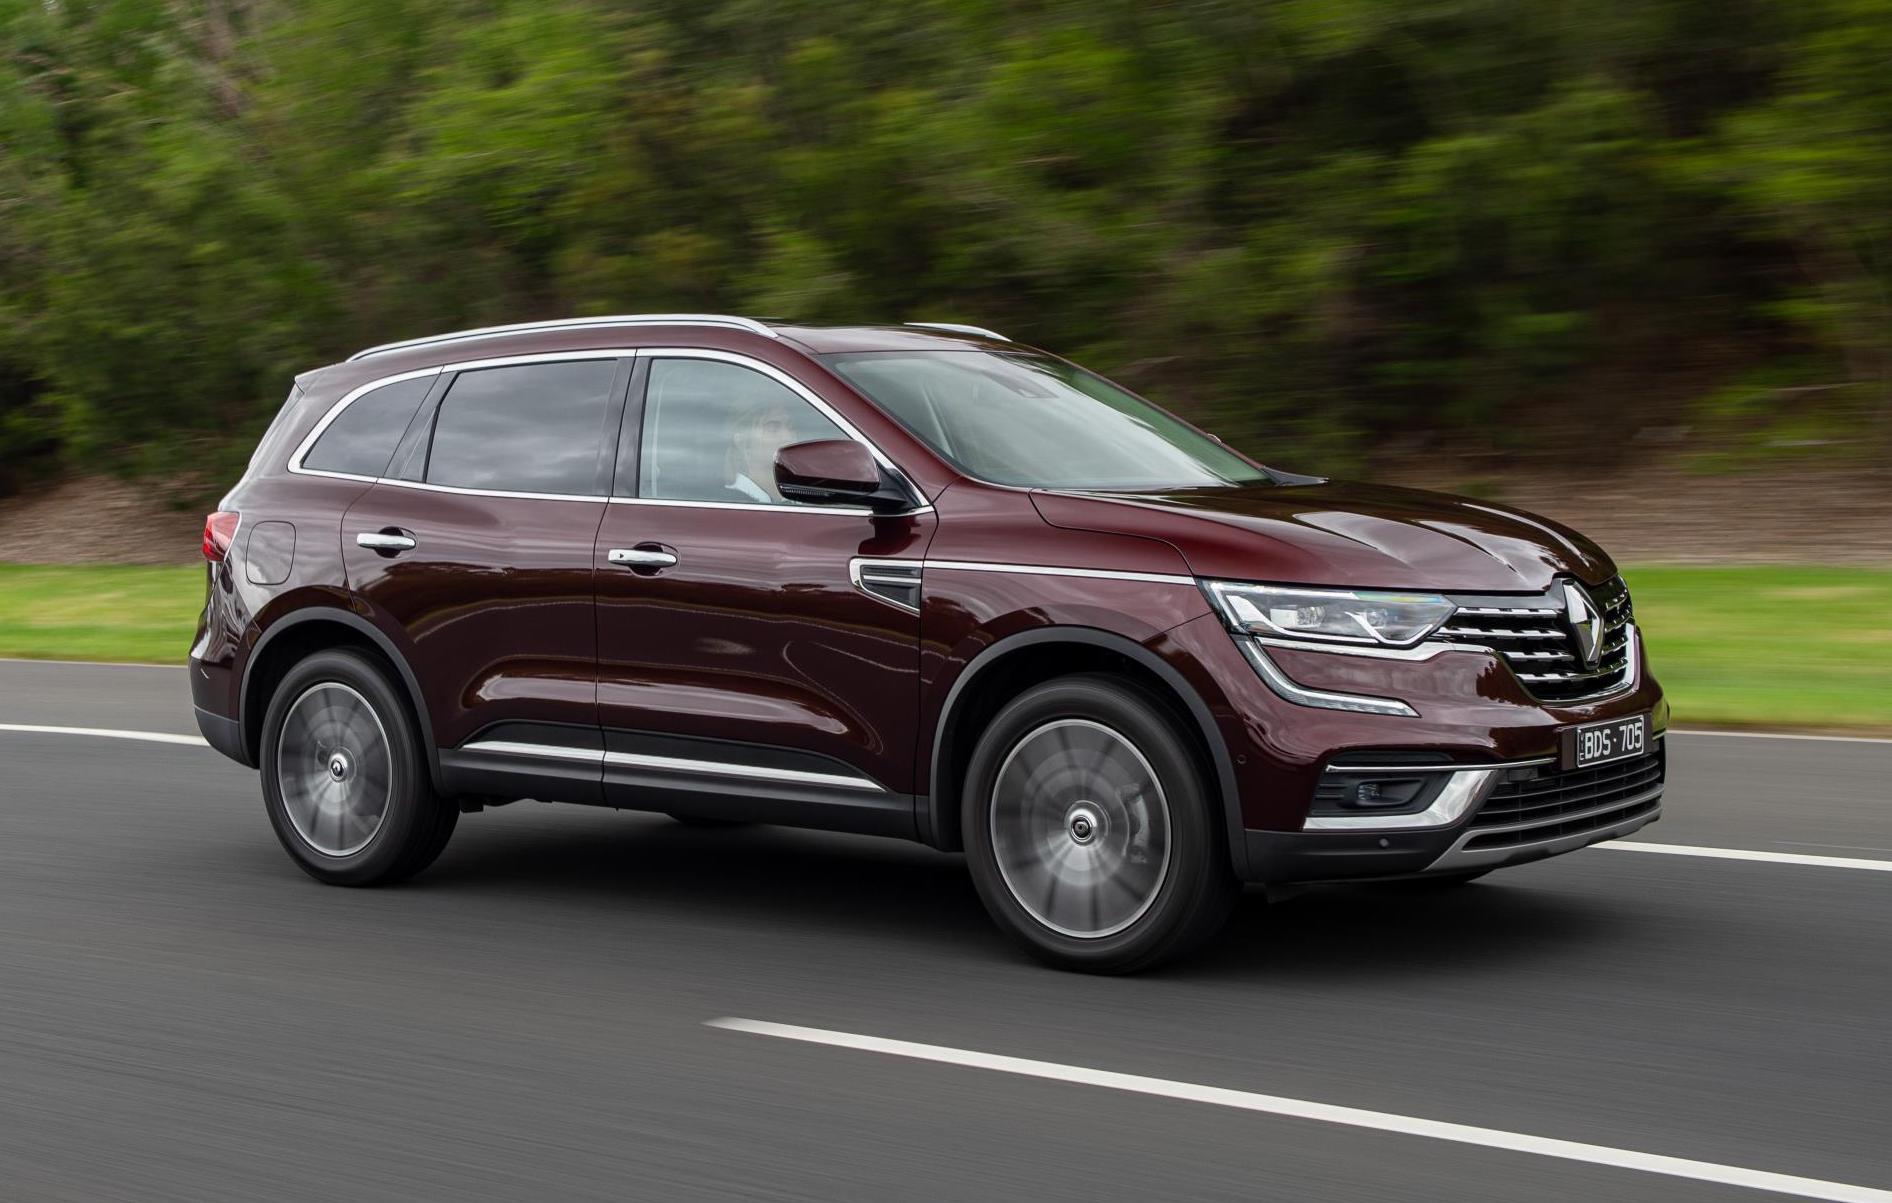 2020 Renault Koleos Update Now On Sale In Australia Performancedrive